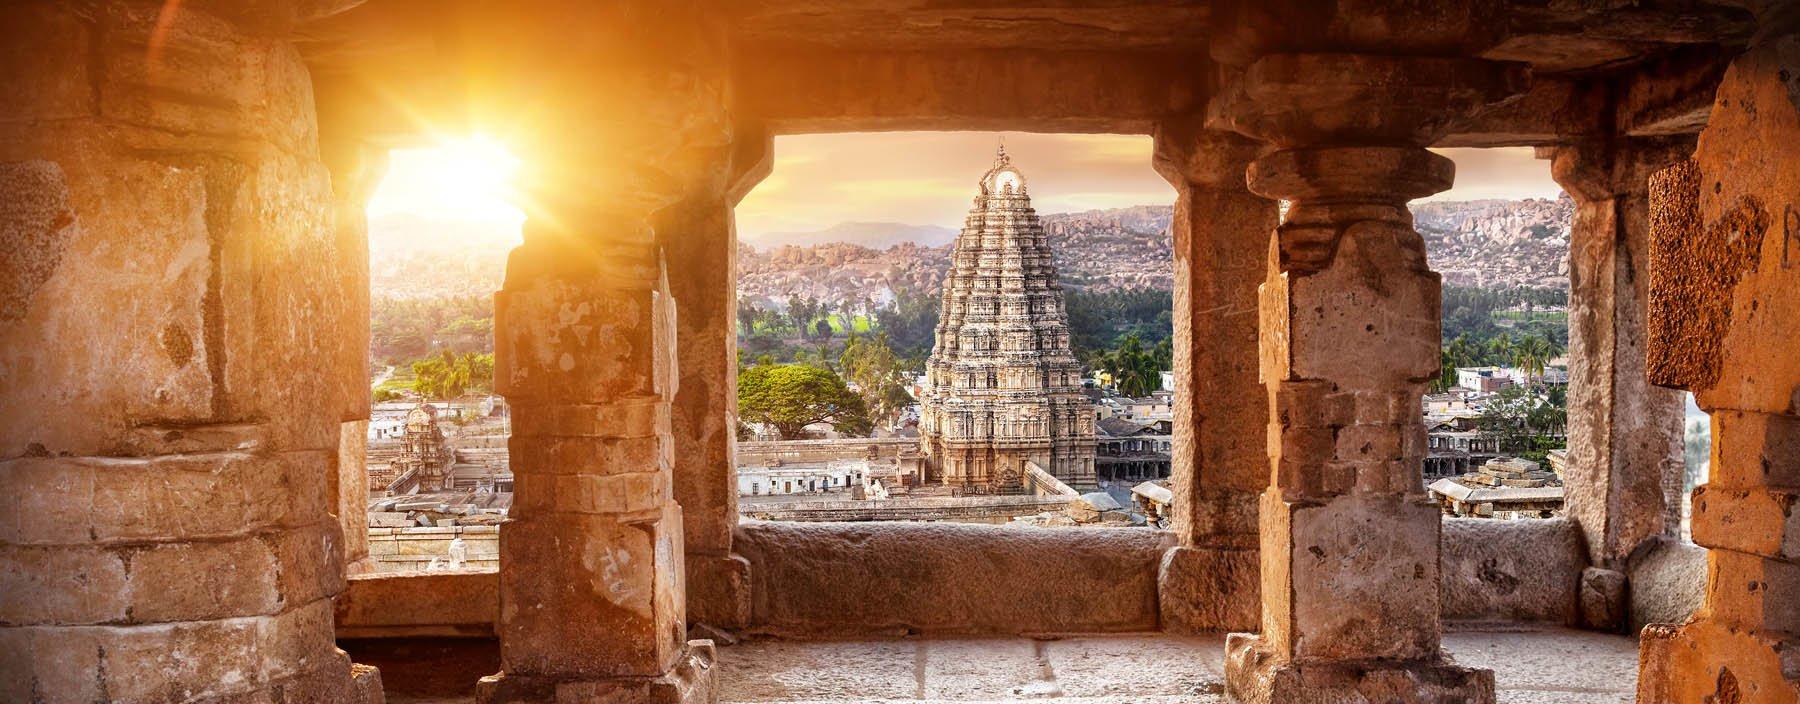 in, hampi, virupaksha temple view from the hemakuta hill.jpg